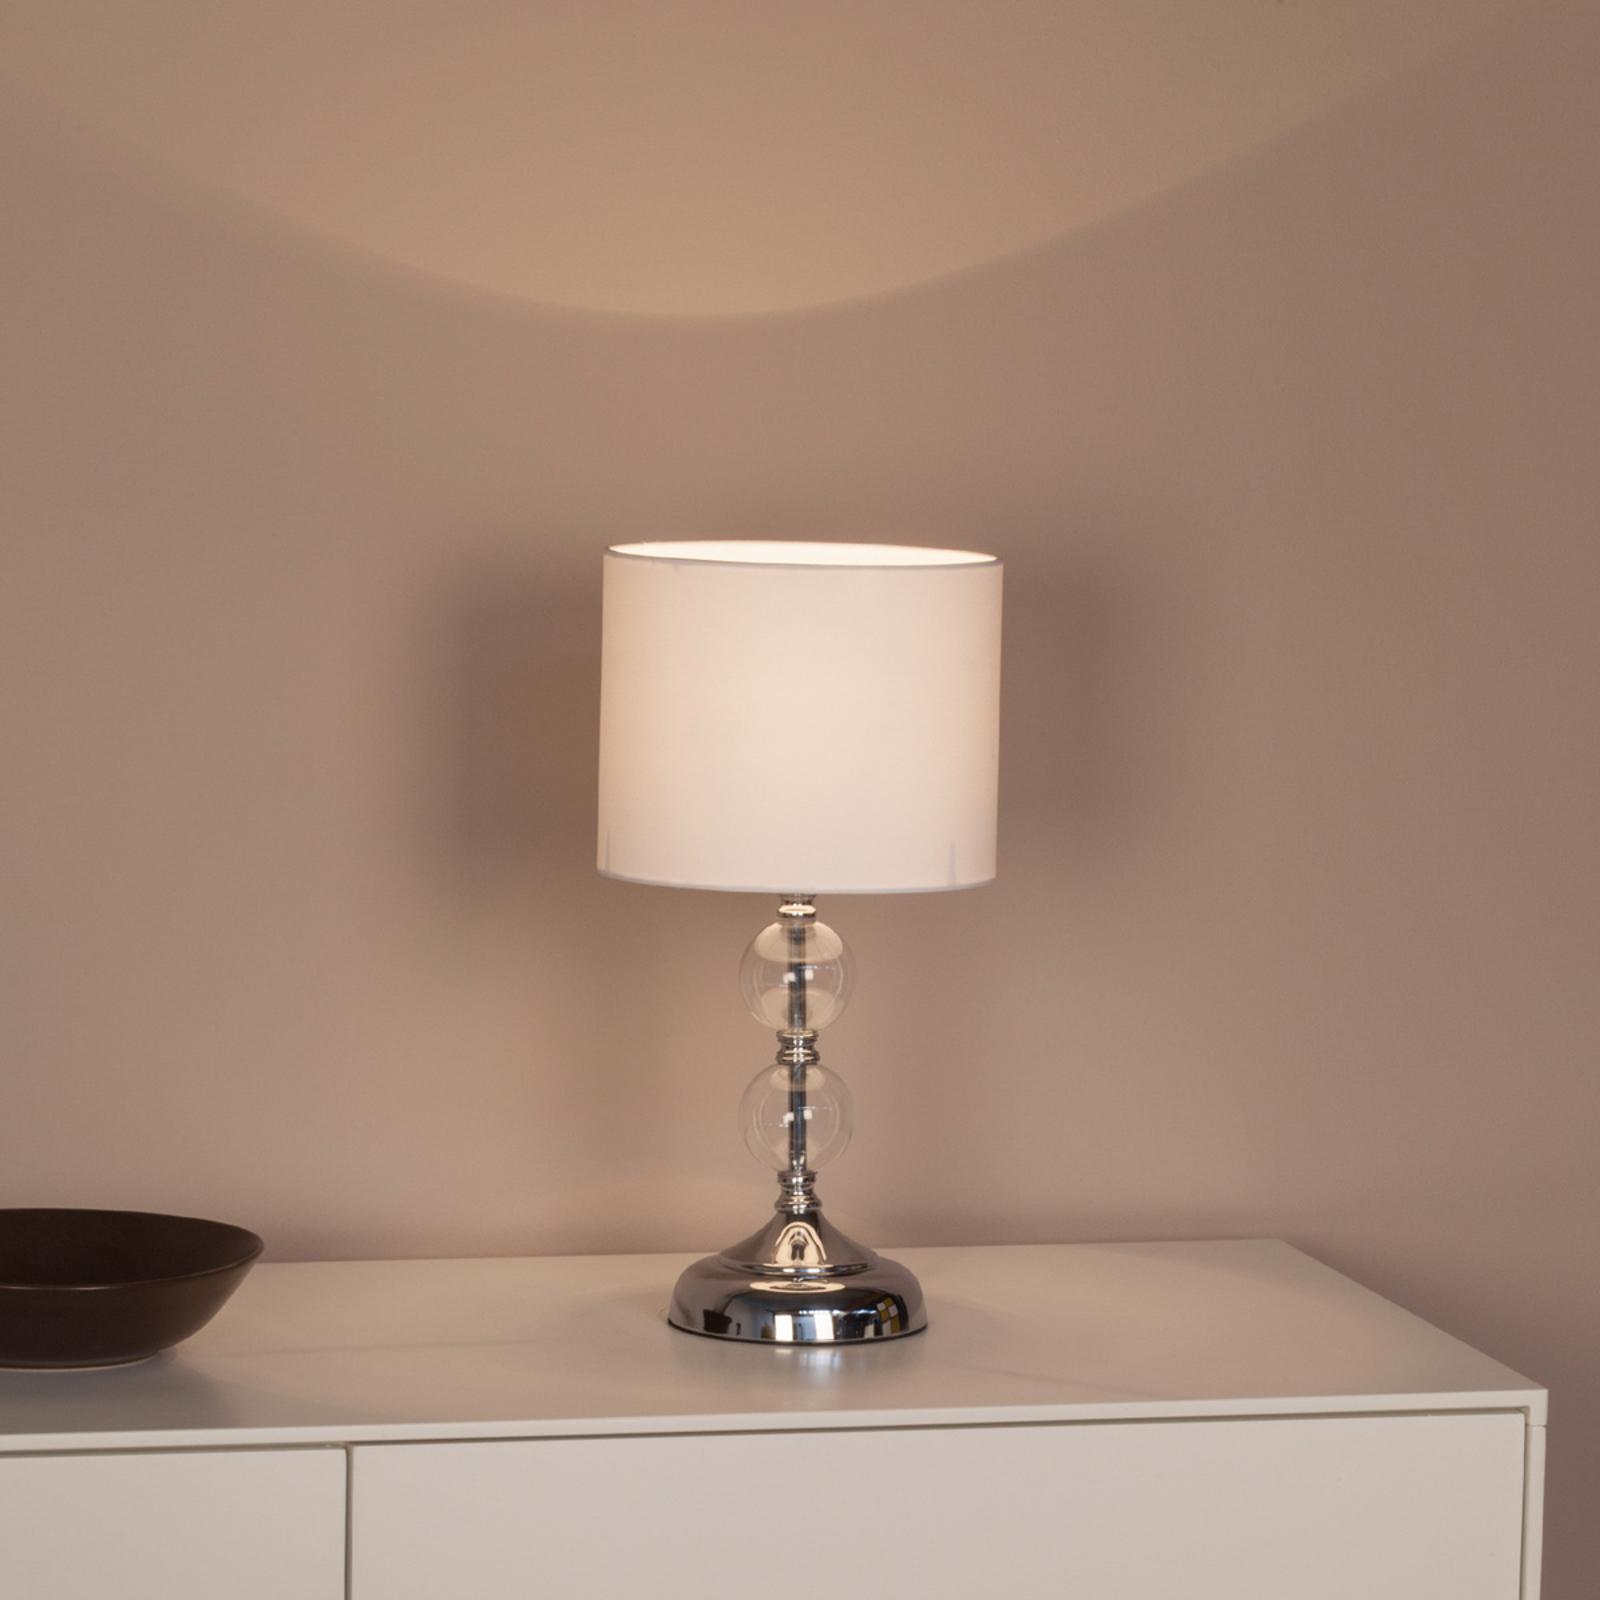 Decoratieve tafellamp Rome met textielen kap